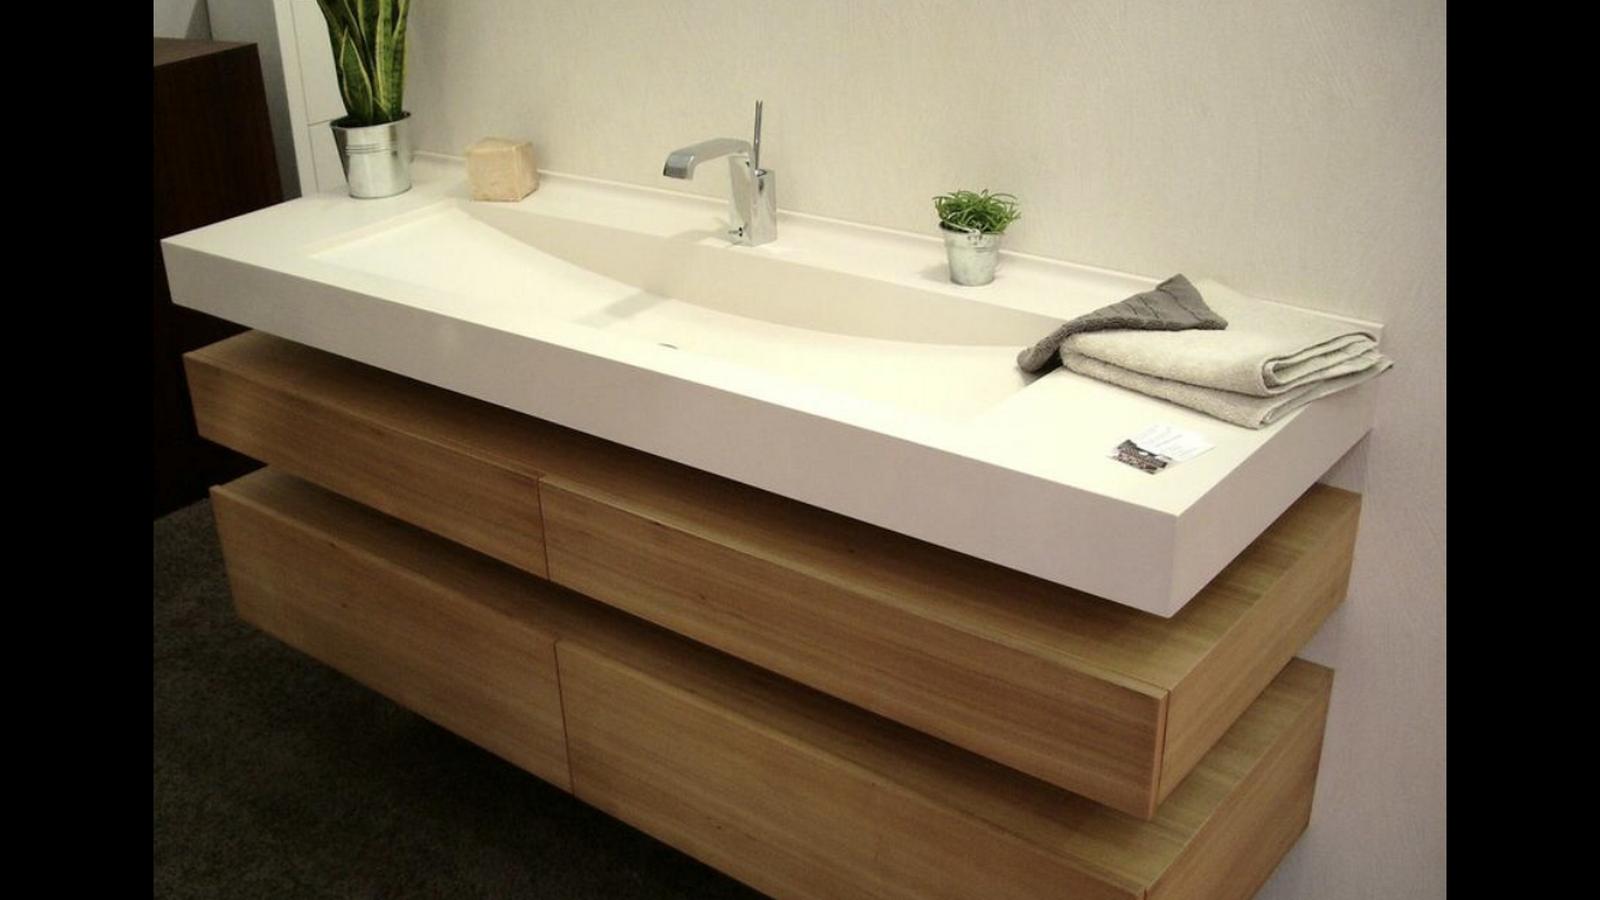 installation de cuisine sur mesure lyon cr ative pose. Black Bedroom Furniture Sets. Home Design Ideas